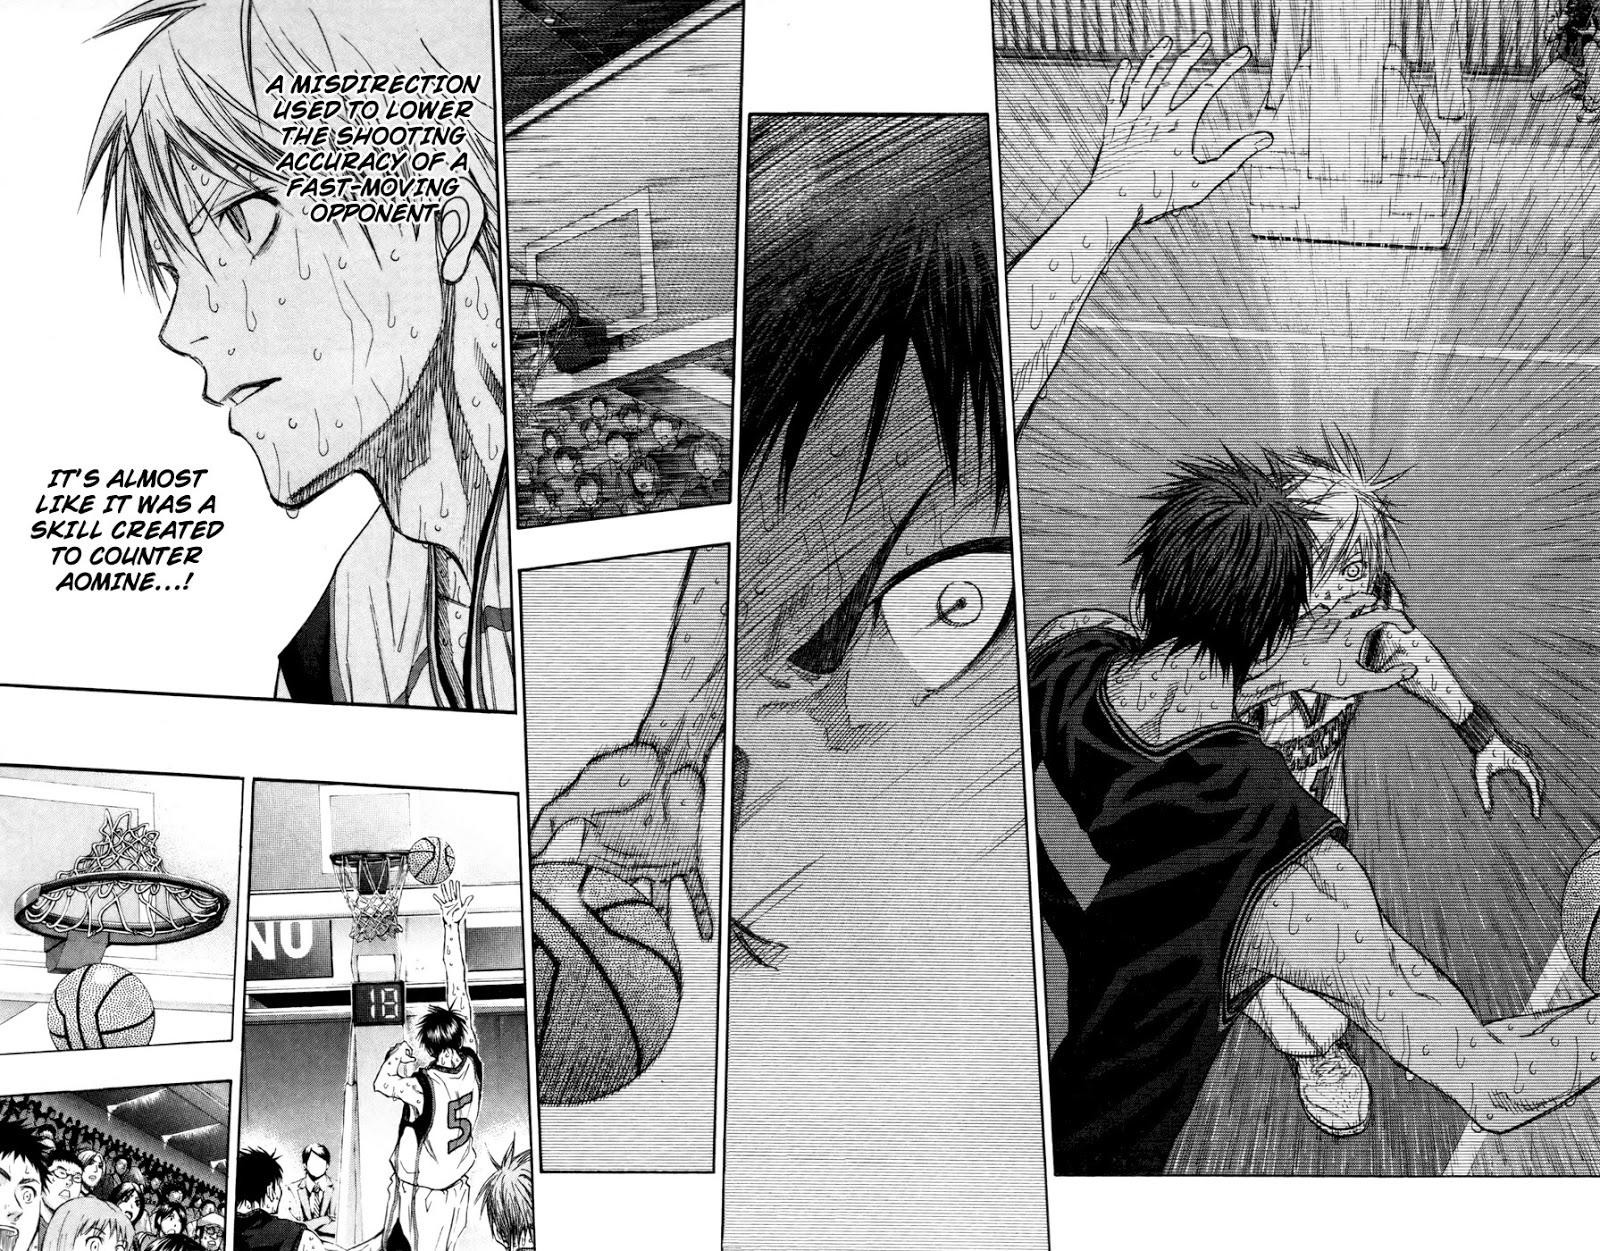 Kuroko no Basket Manga Chapter 132 - Image 13-13